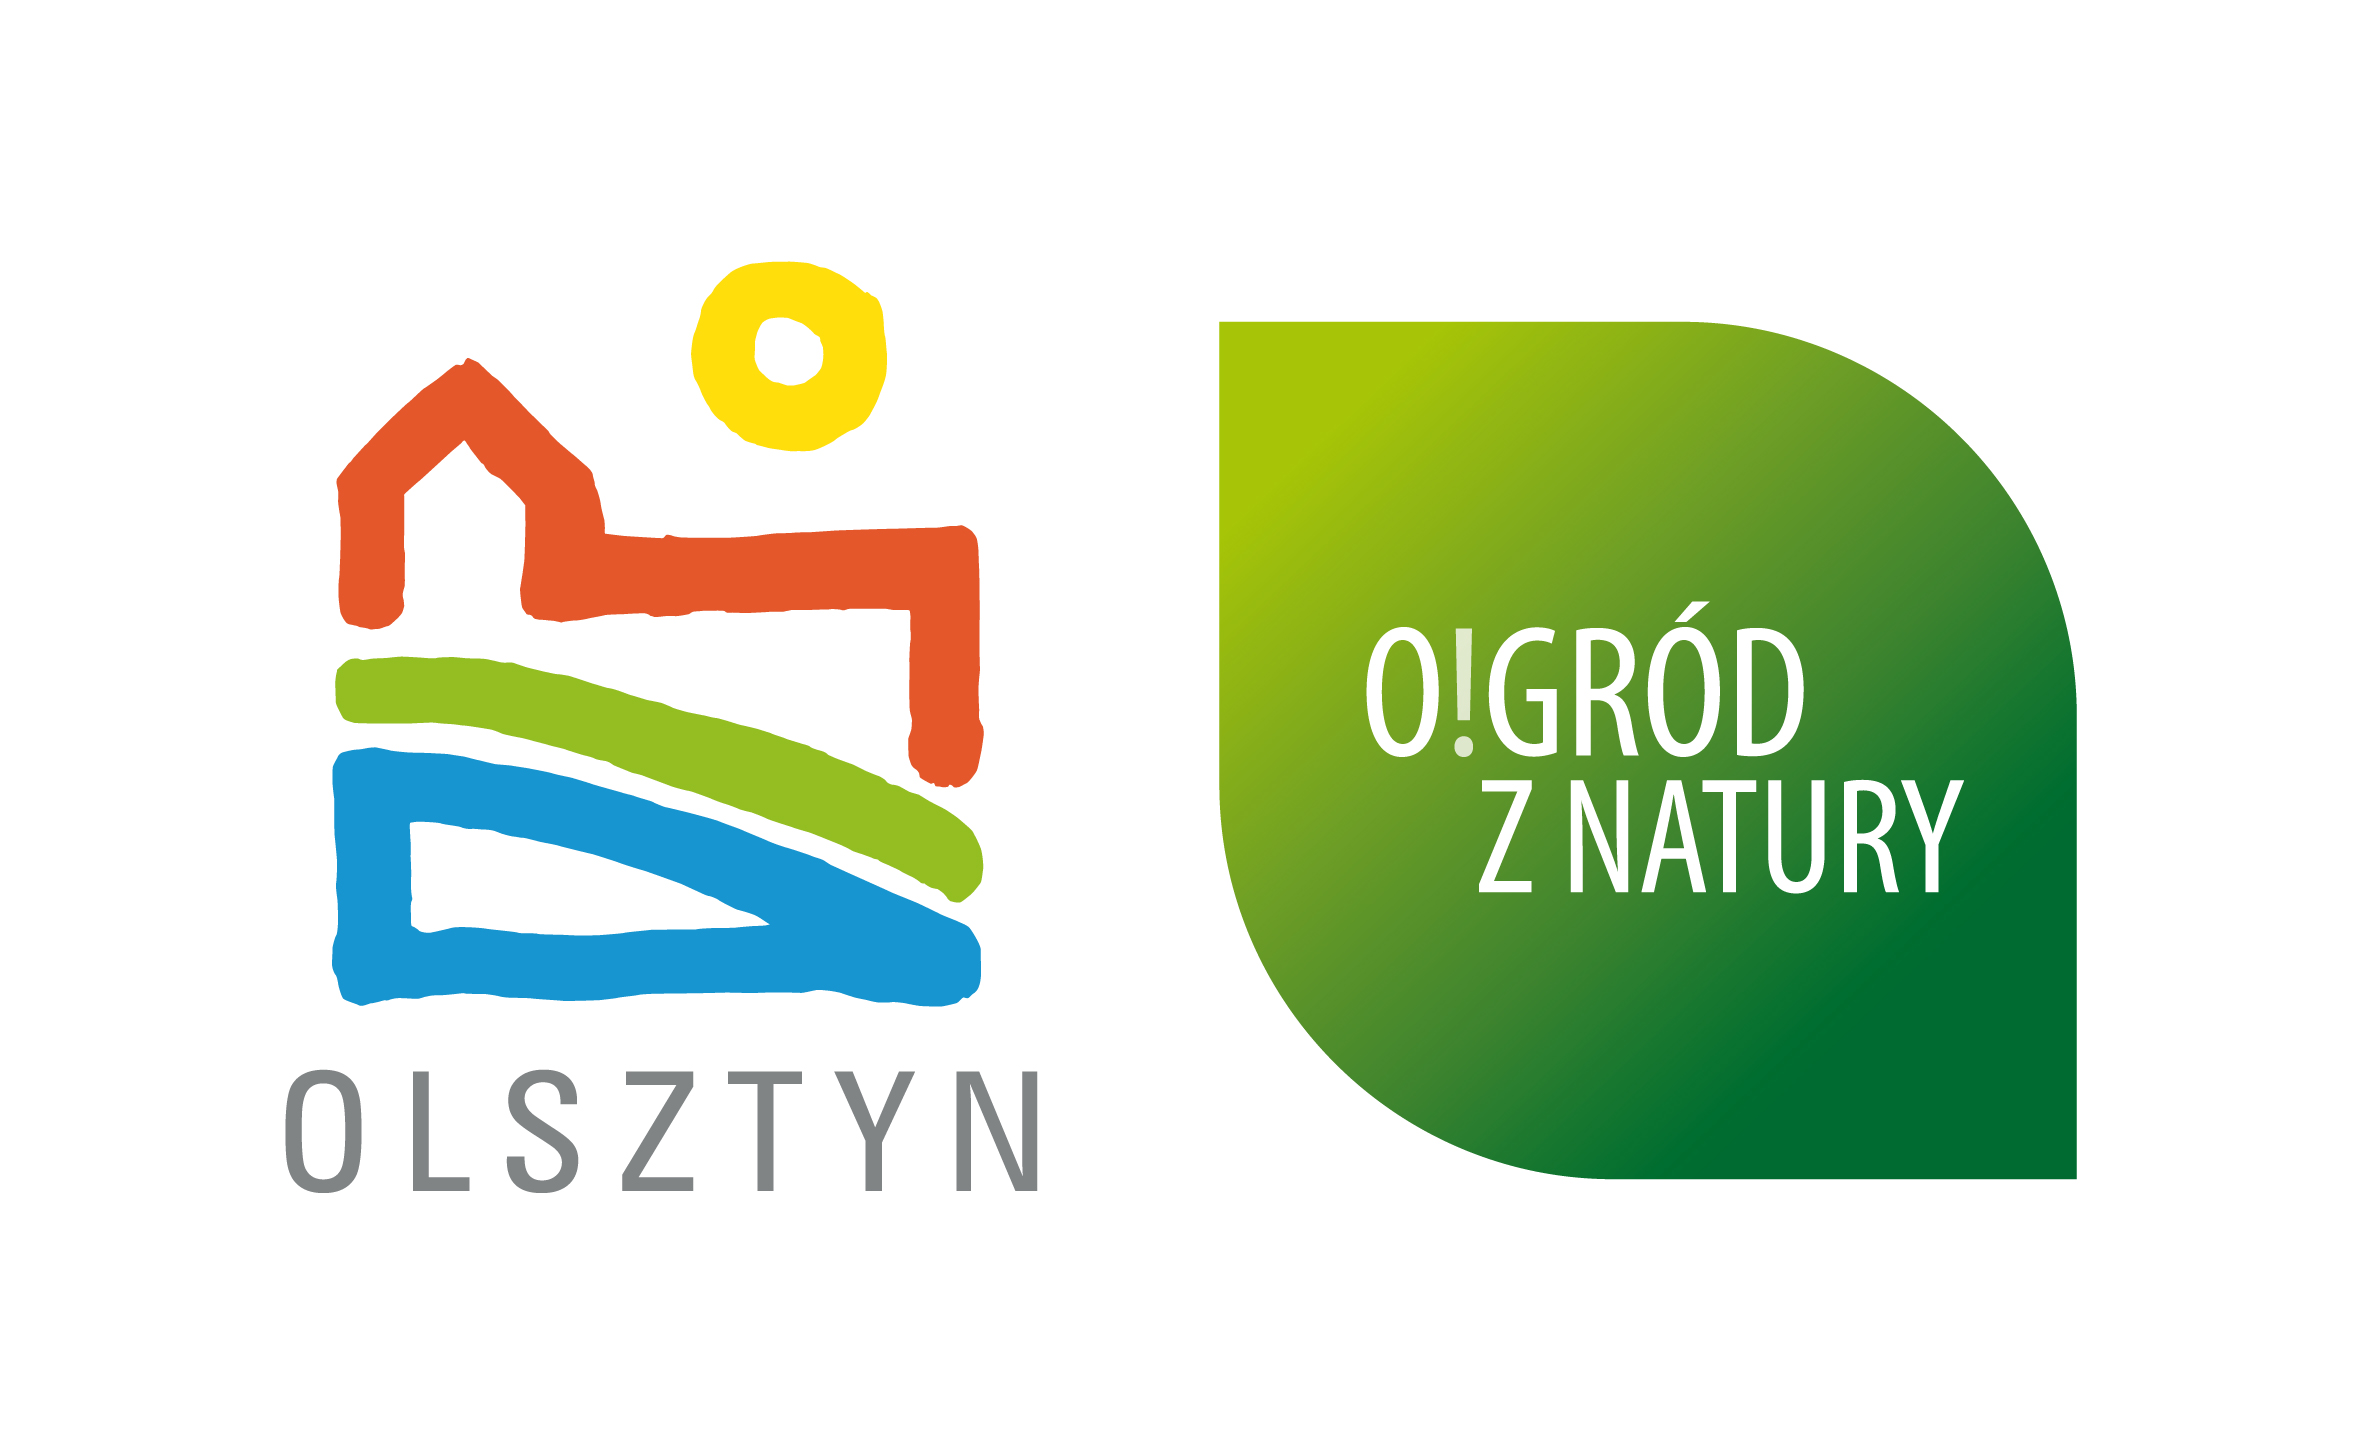 http://m.wm.pl/2017/02/orig/logo-z-listkiem-368923.jpg